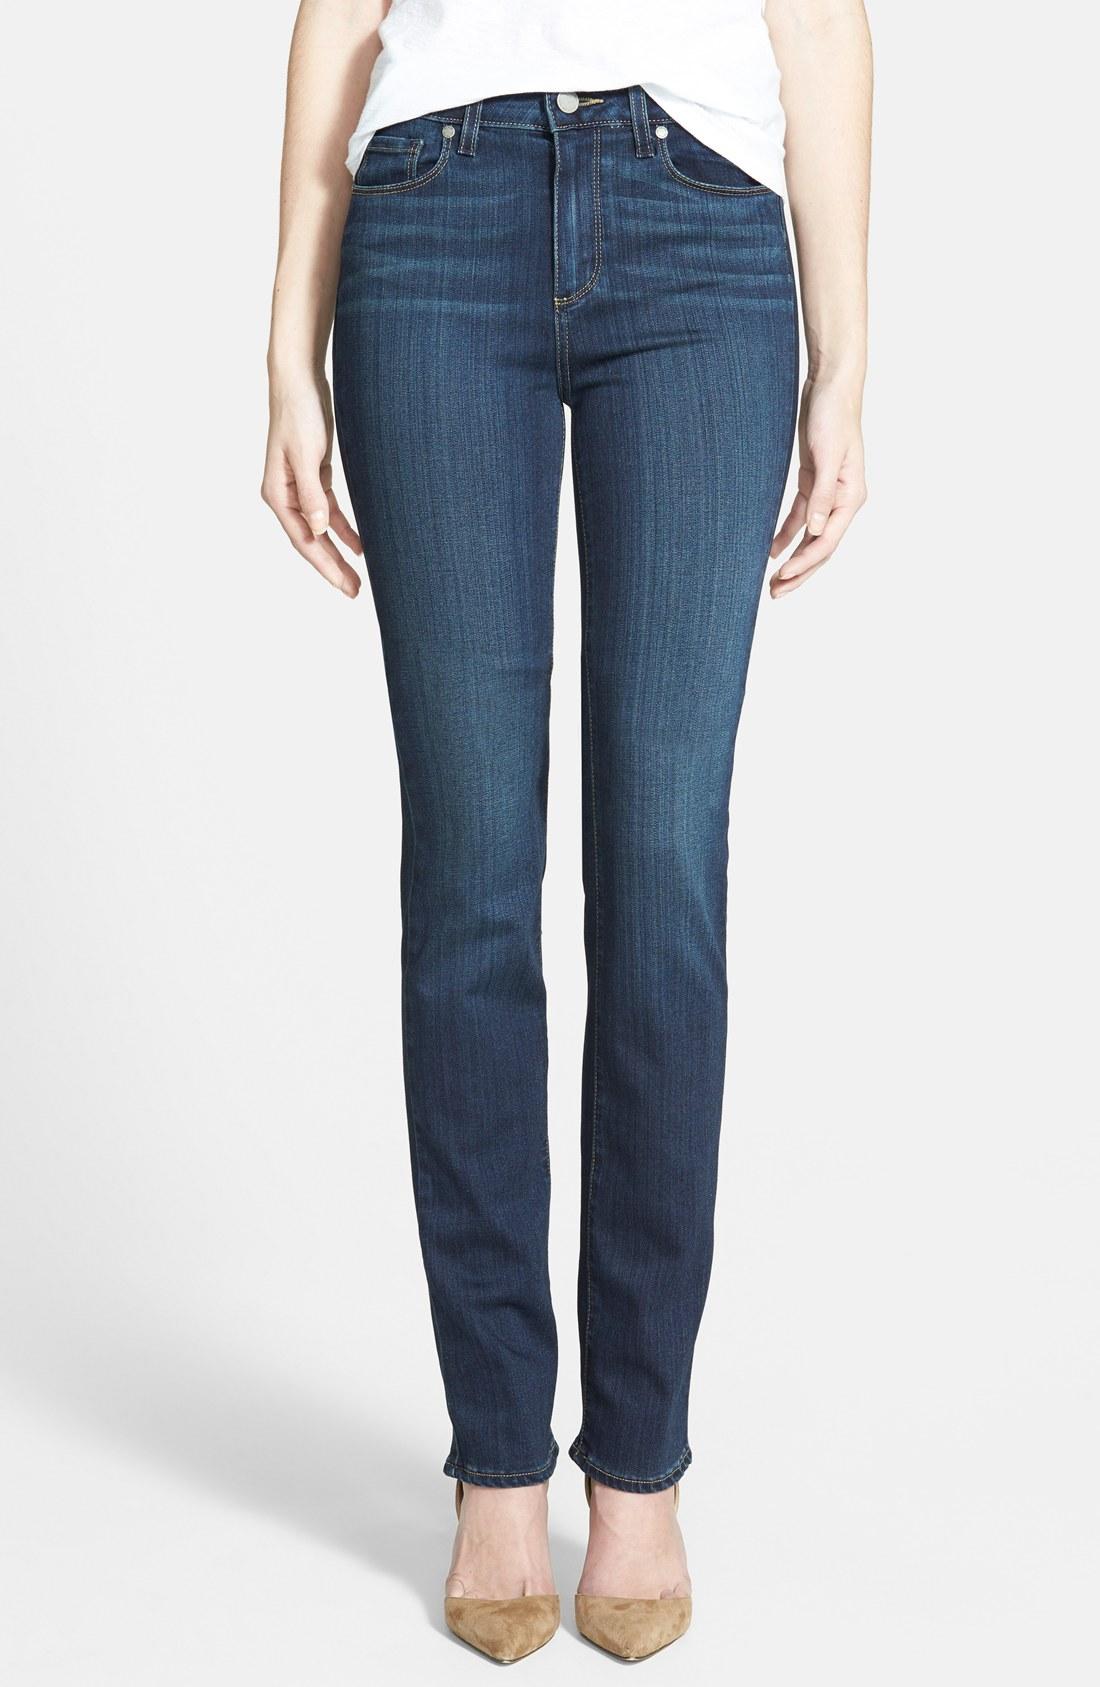 paige u0027transcend - hoxtonu0027 high rise straight leg jeans (nottingham ... cefmepw